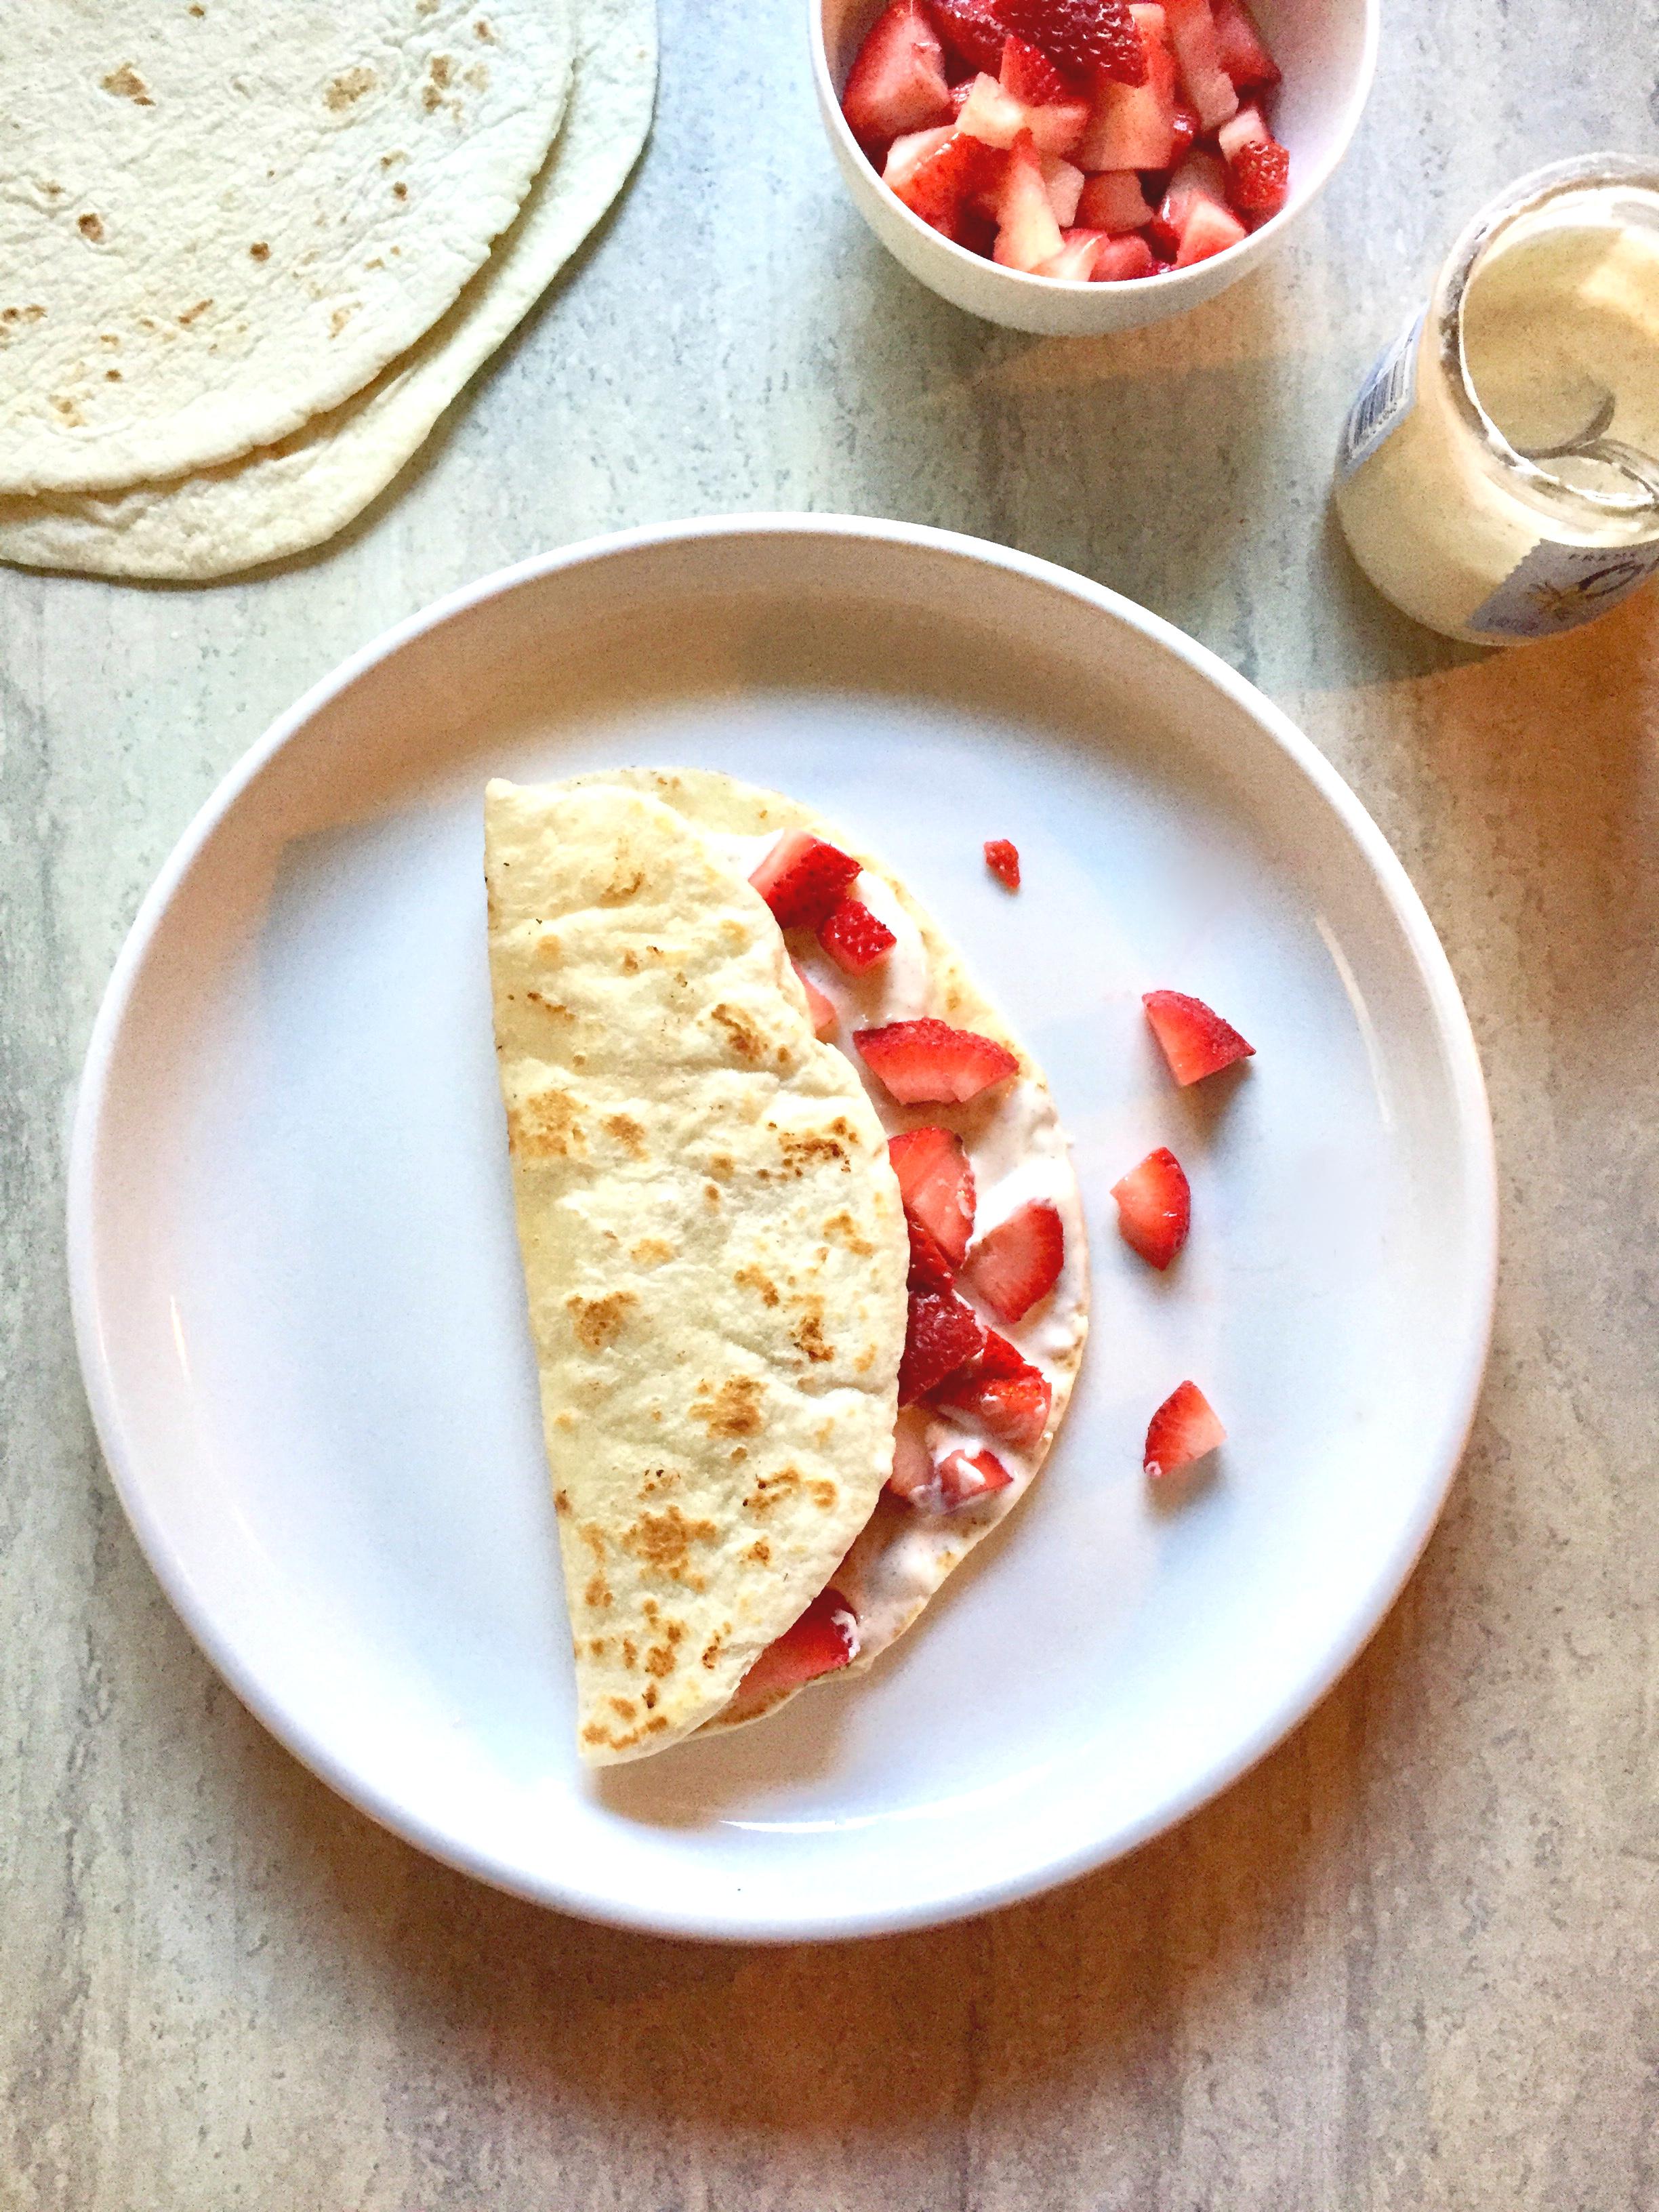 Strawberry Cheesecake Dessert Taco